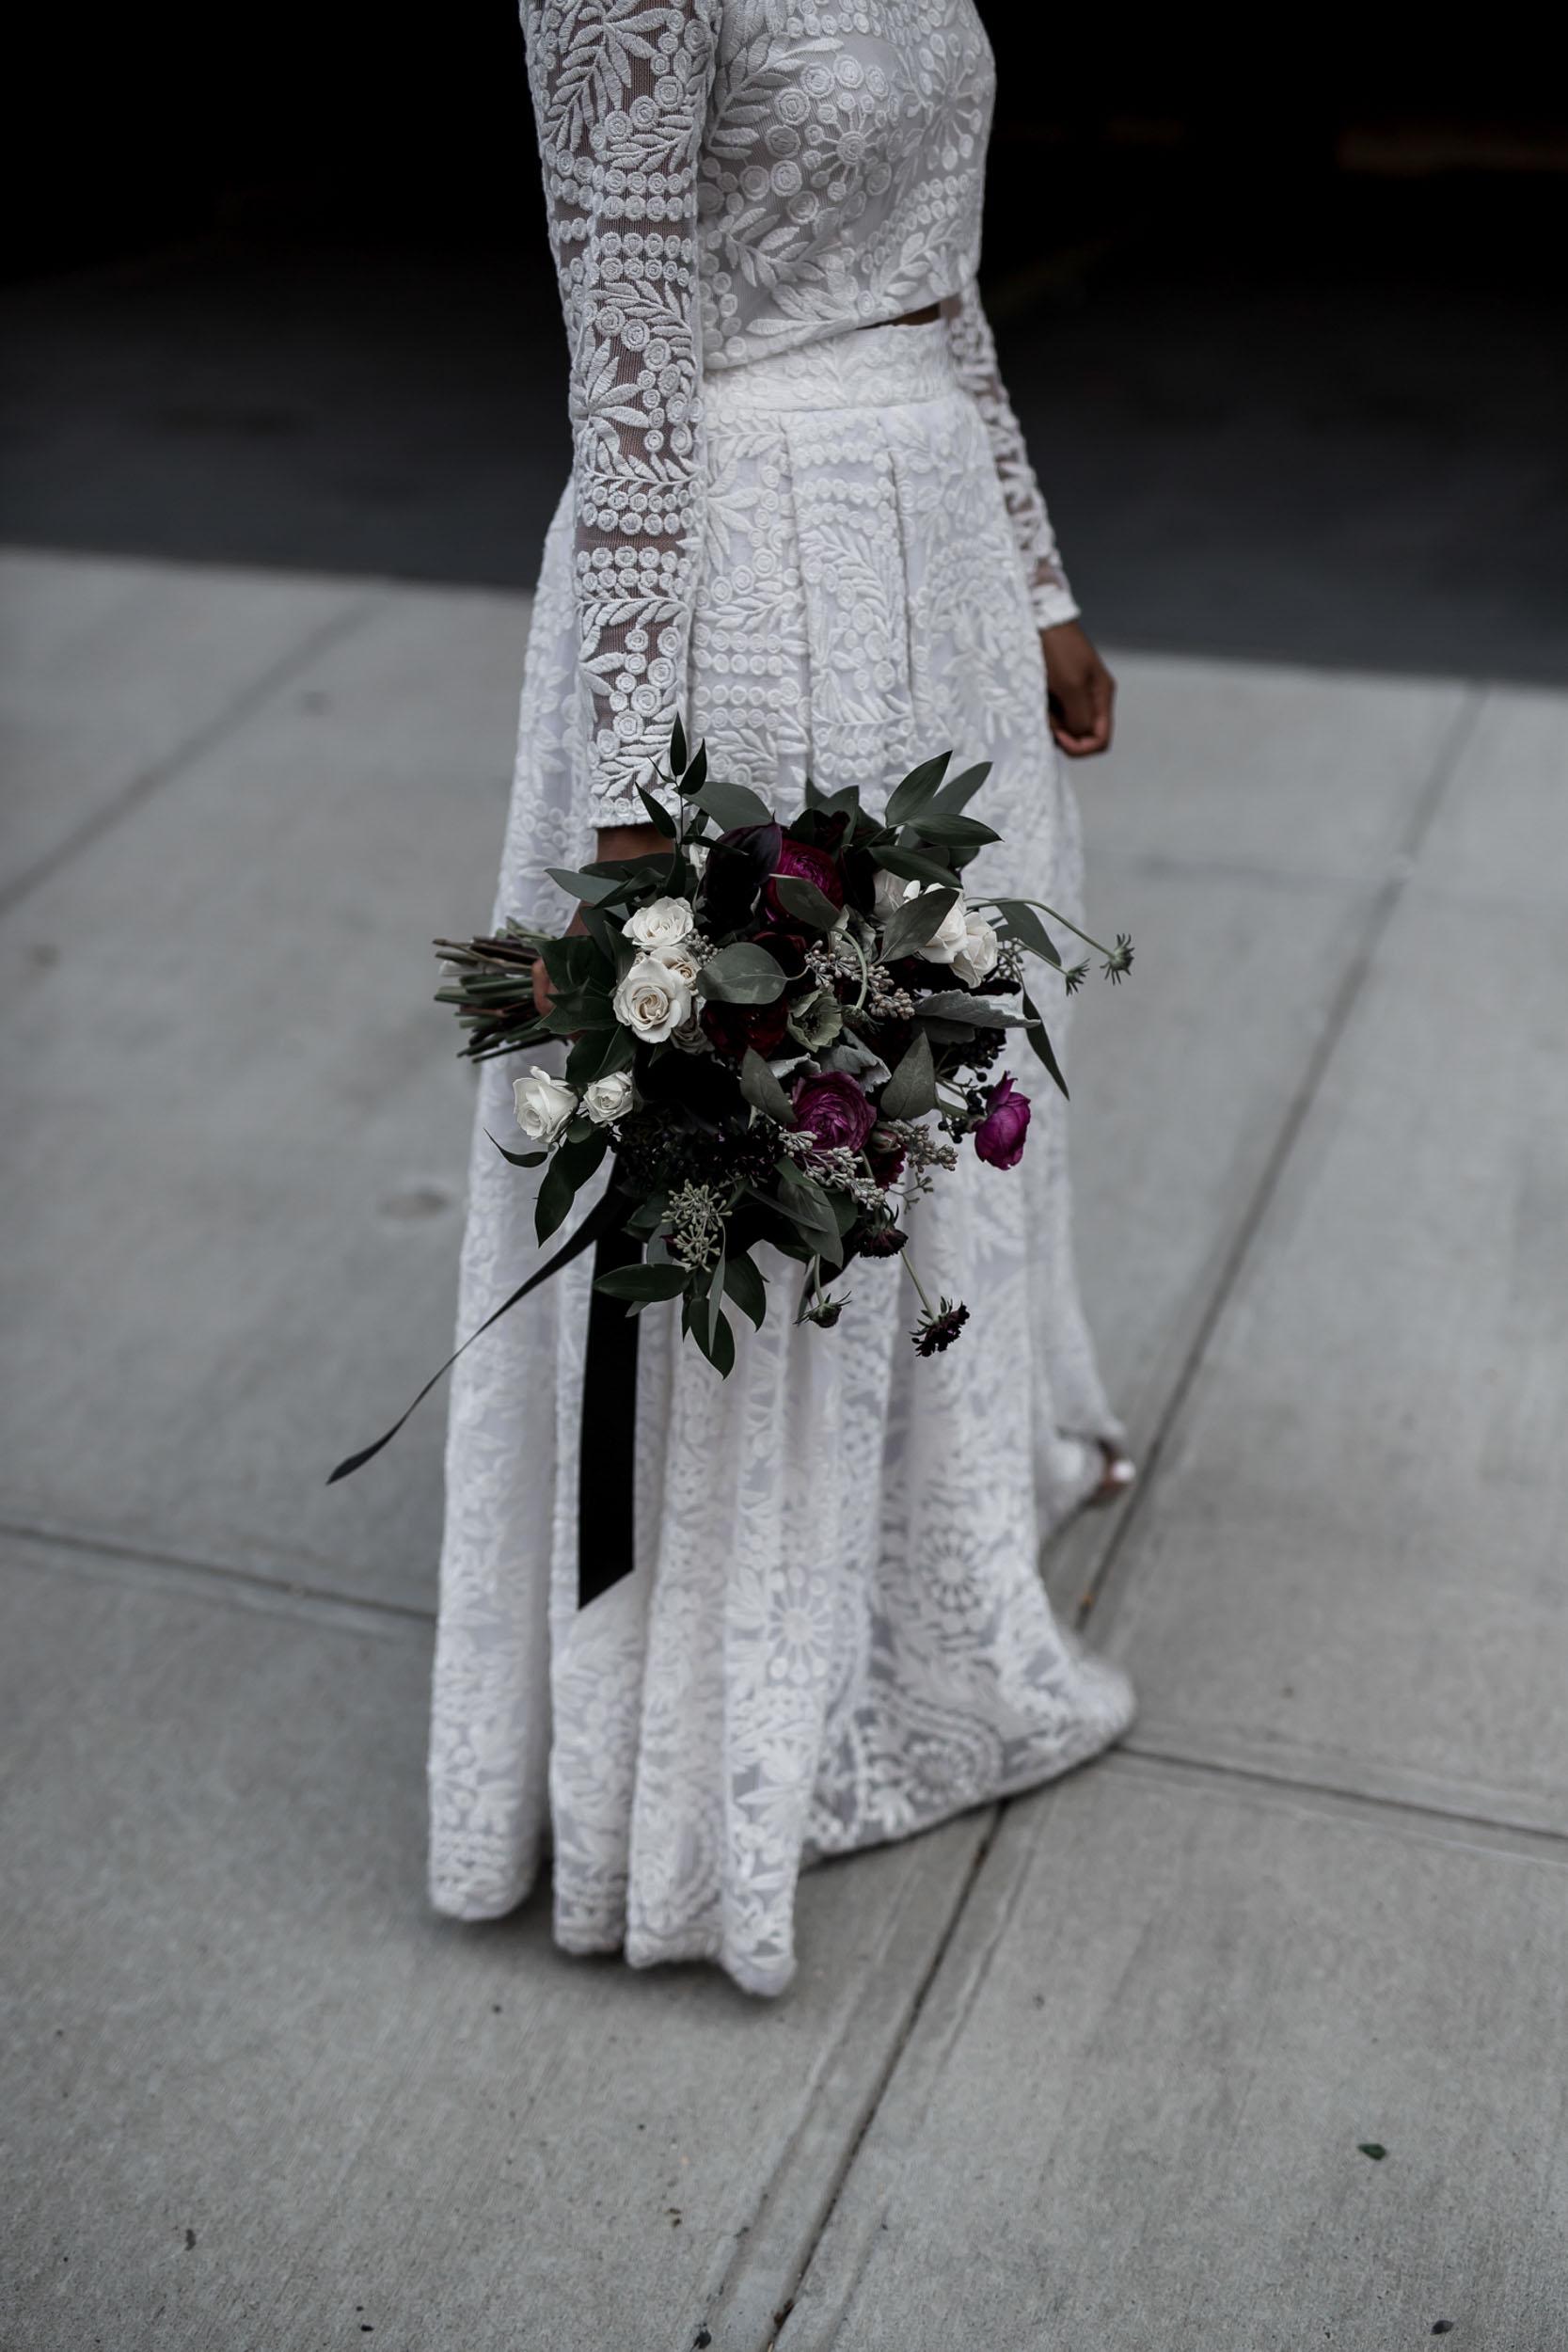 THE FLOWERS - FLORIST : Julia Testa